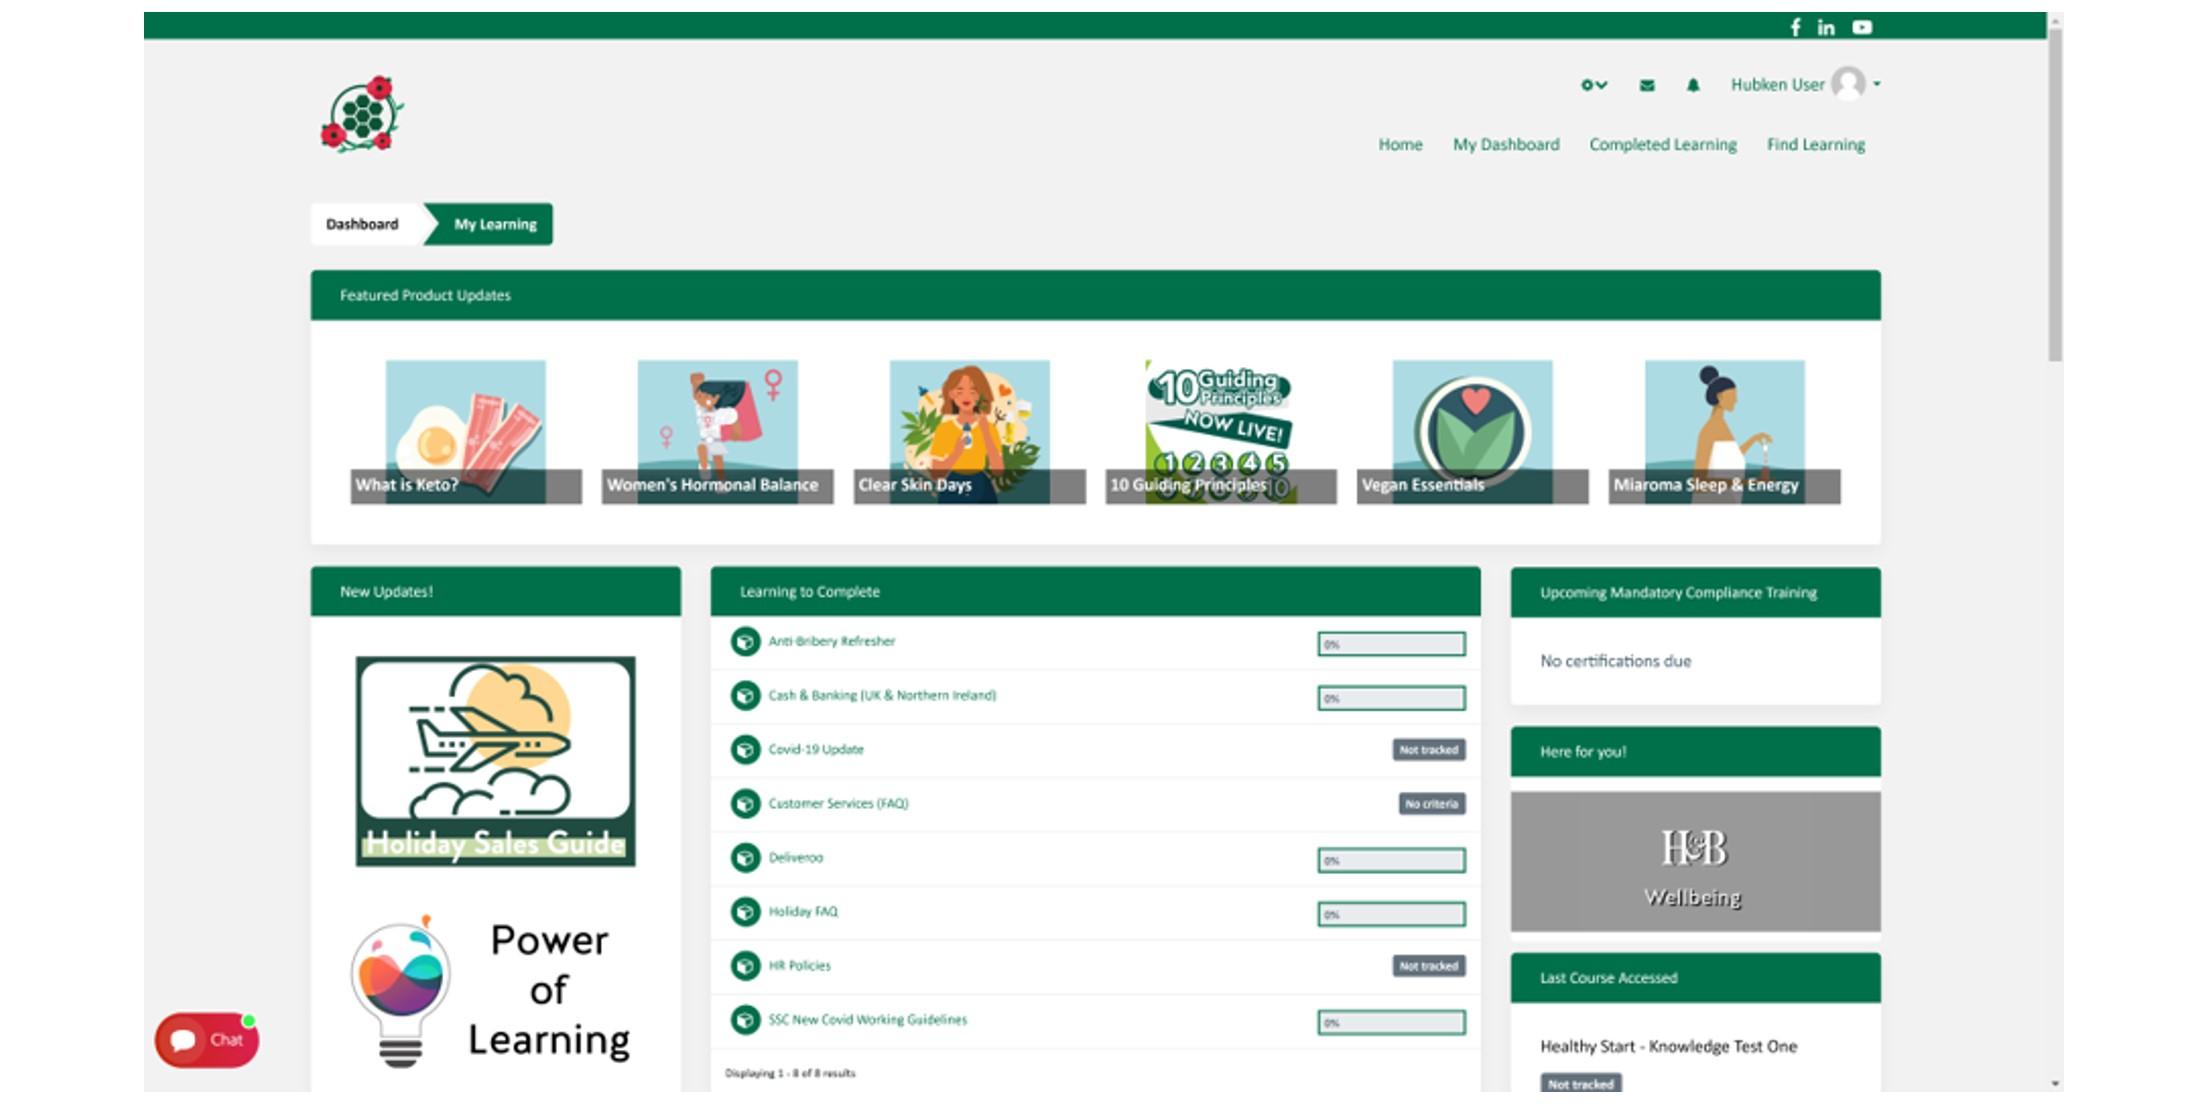 e-Learning for Retail - Holland & Barrett Screenshot